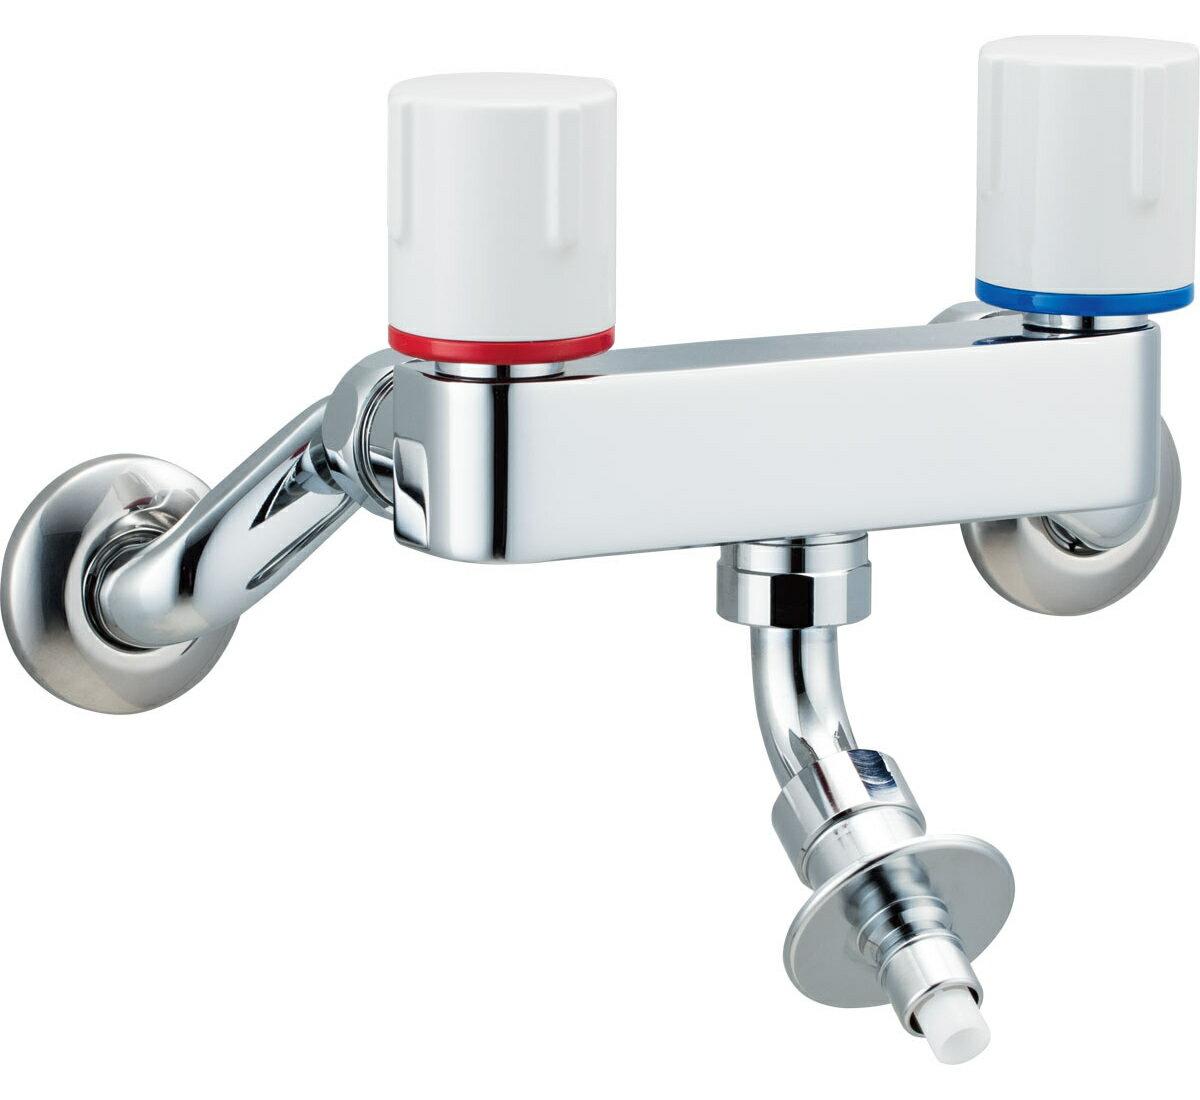 INAX[イナックス]・LIXIL[リクシル] 【SF-WL63RQ】 洗濯機用水栓金具 露出タイプ(屋内専用) 緊急止水弁付2ハンドル混合水栓 [新品]【RCP】